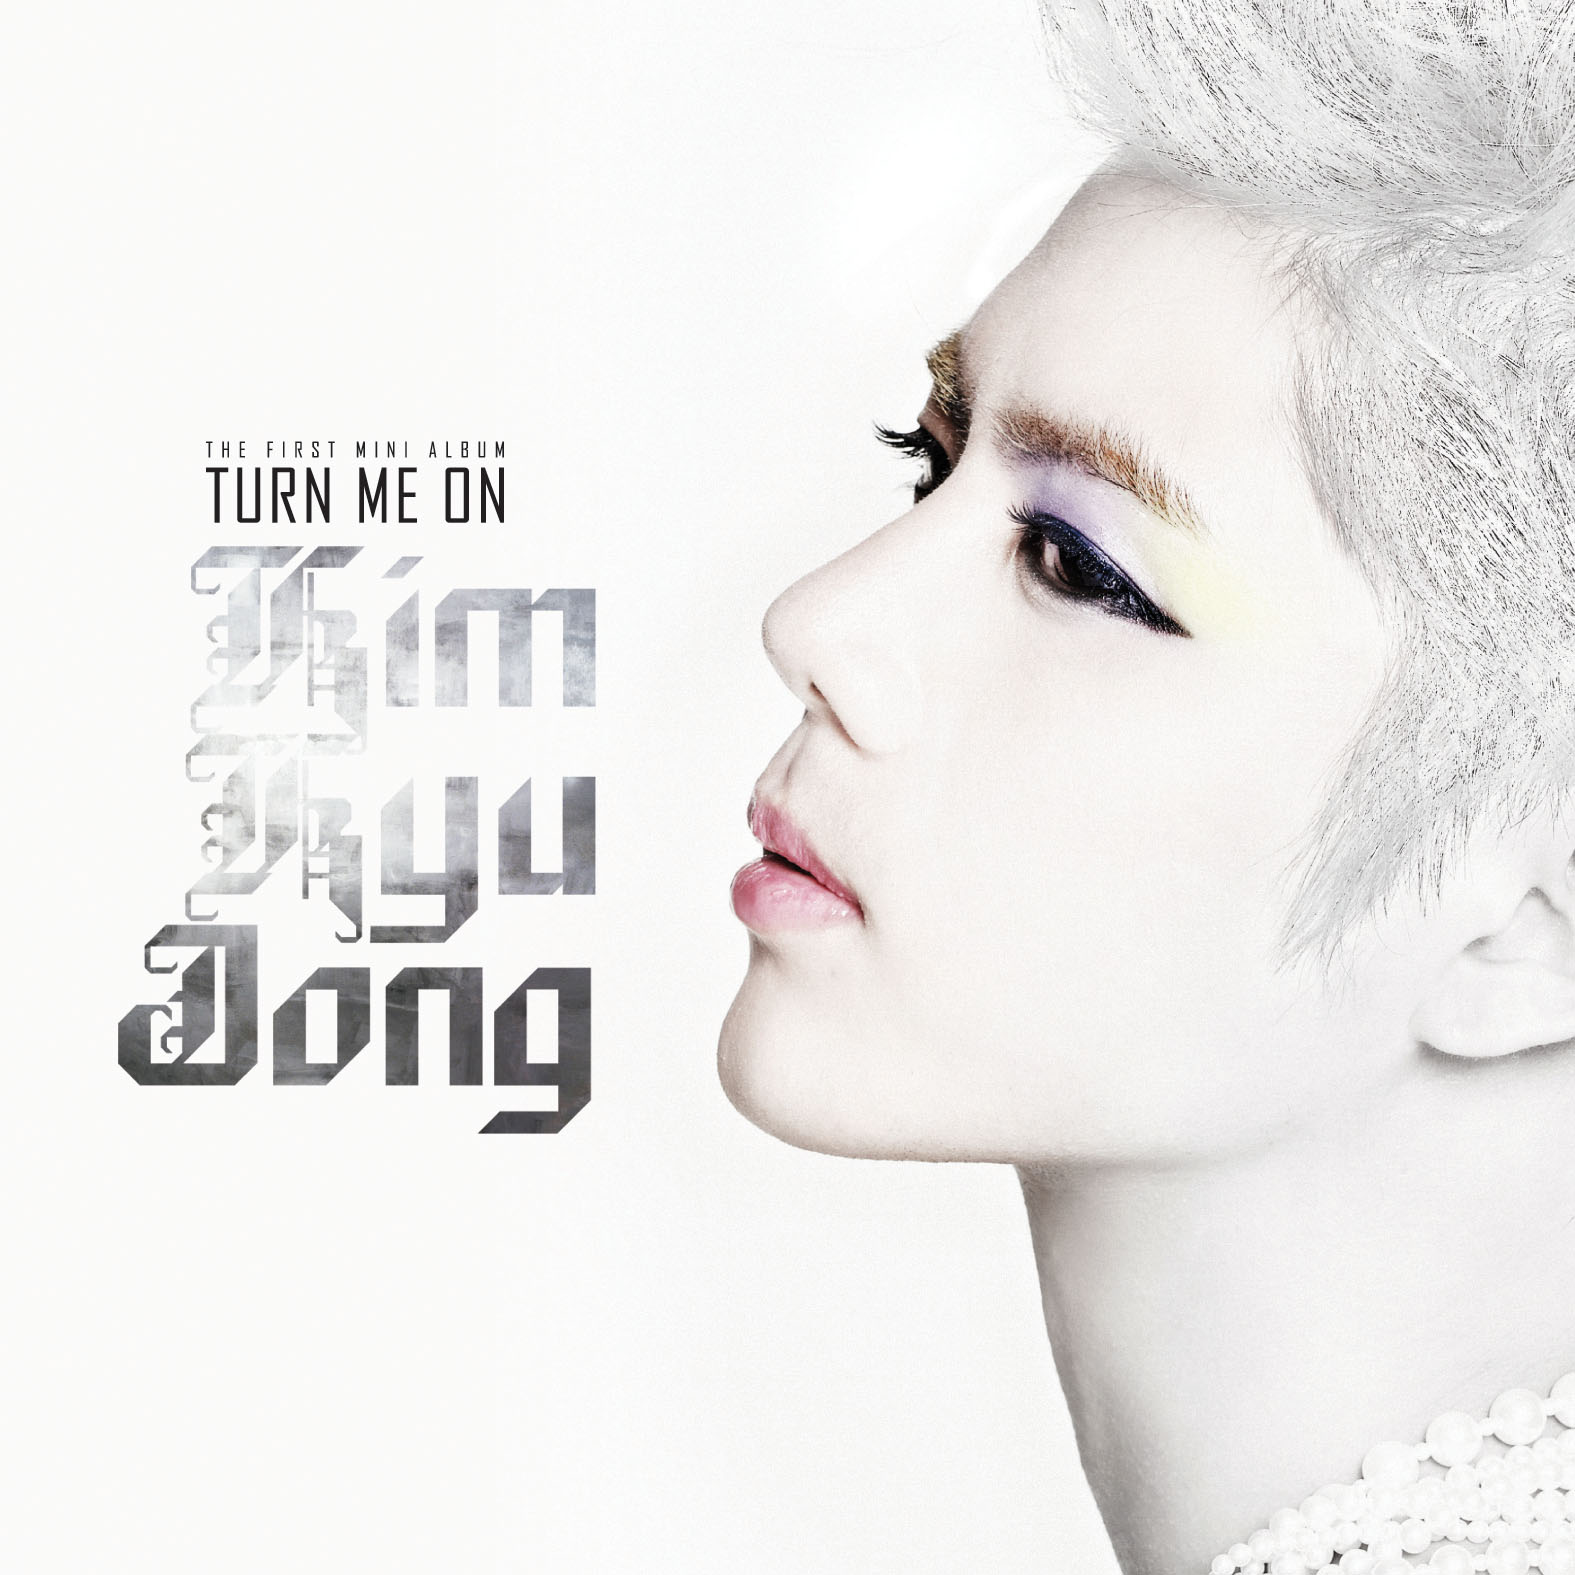 『TURN ME ON』 台灣獨占CD+DVD豪華影音盤